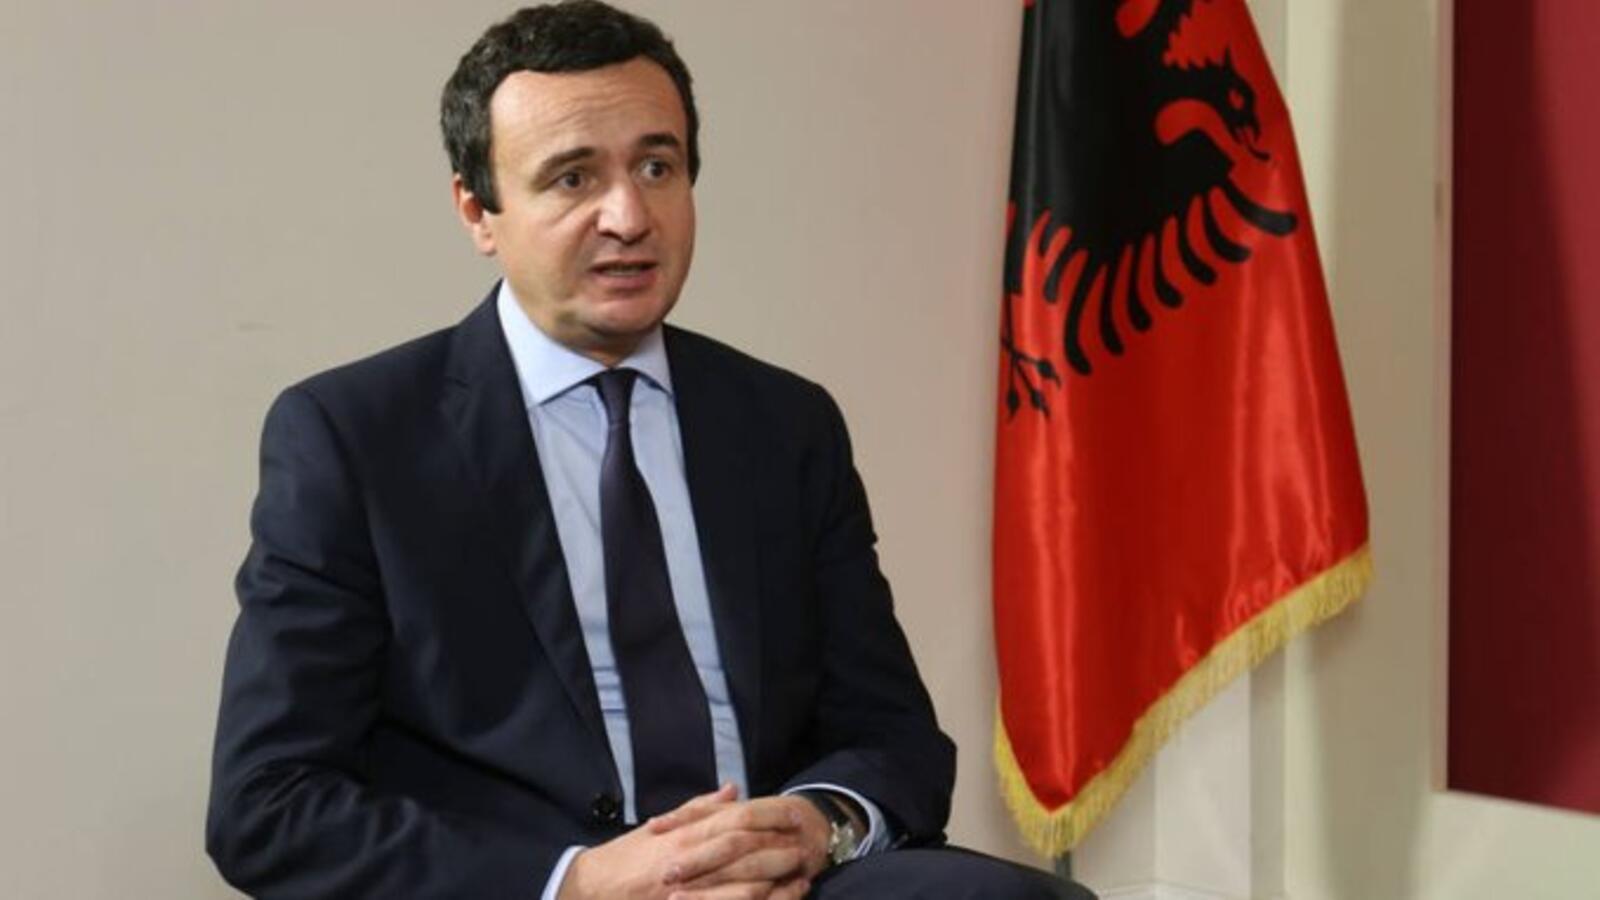 Kosova'da flaş gelişme!  Seçim öncesi Kosova'da skandal yasaklar…